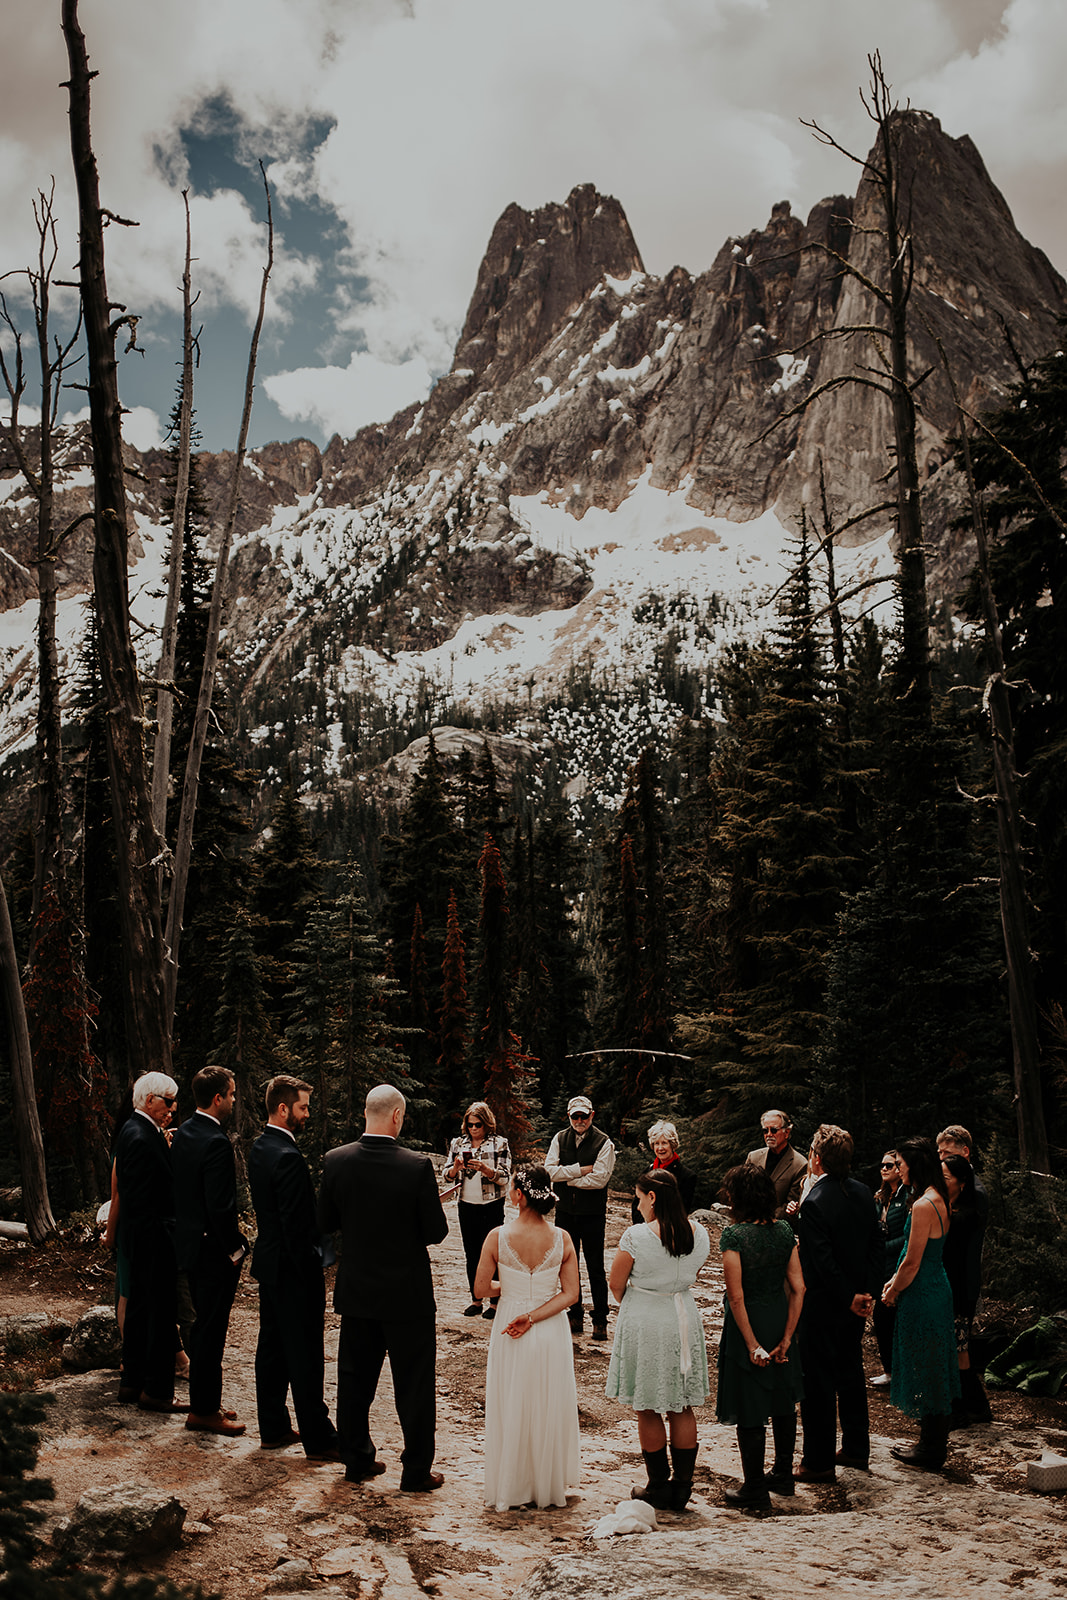 winthrop-wedding-photographer-megan-gallagher-photography (14).jpg